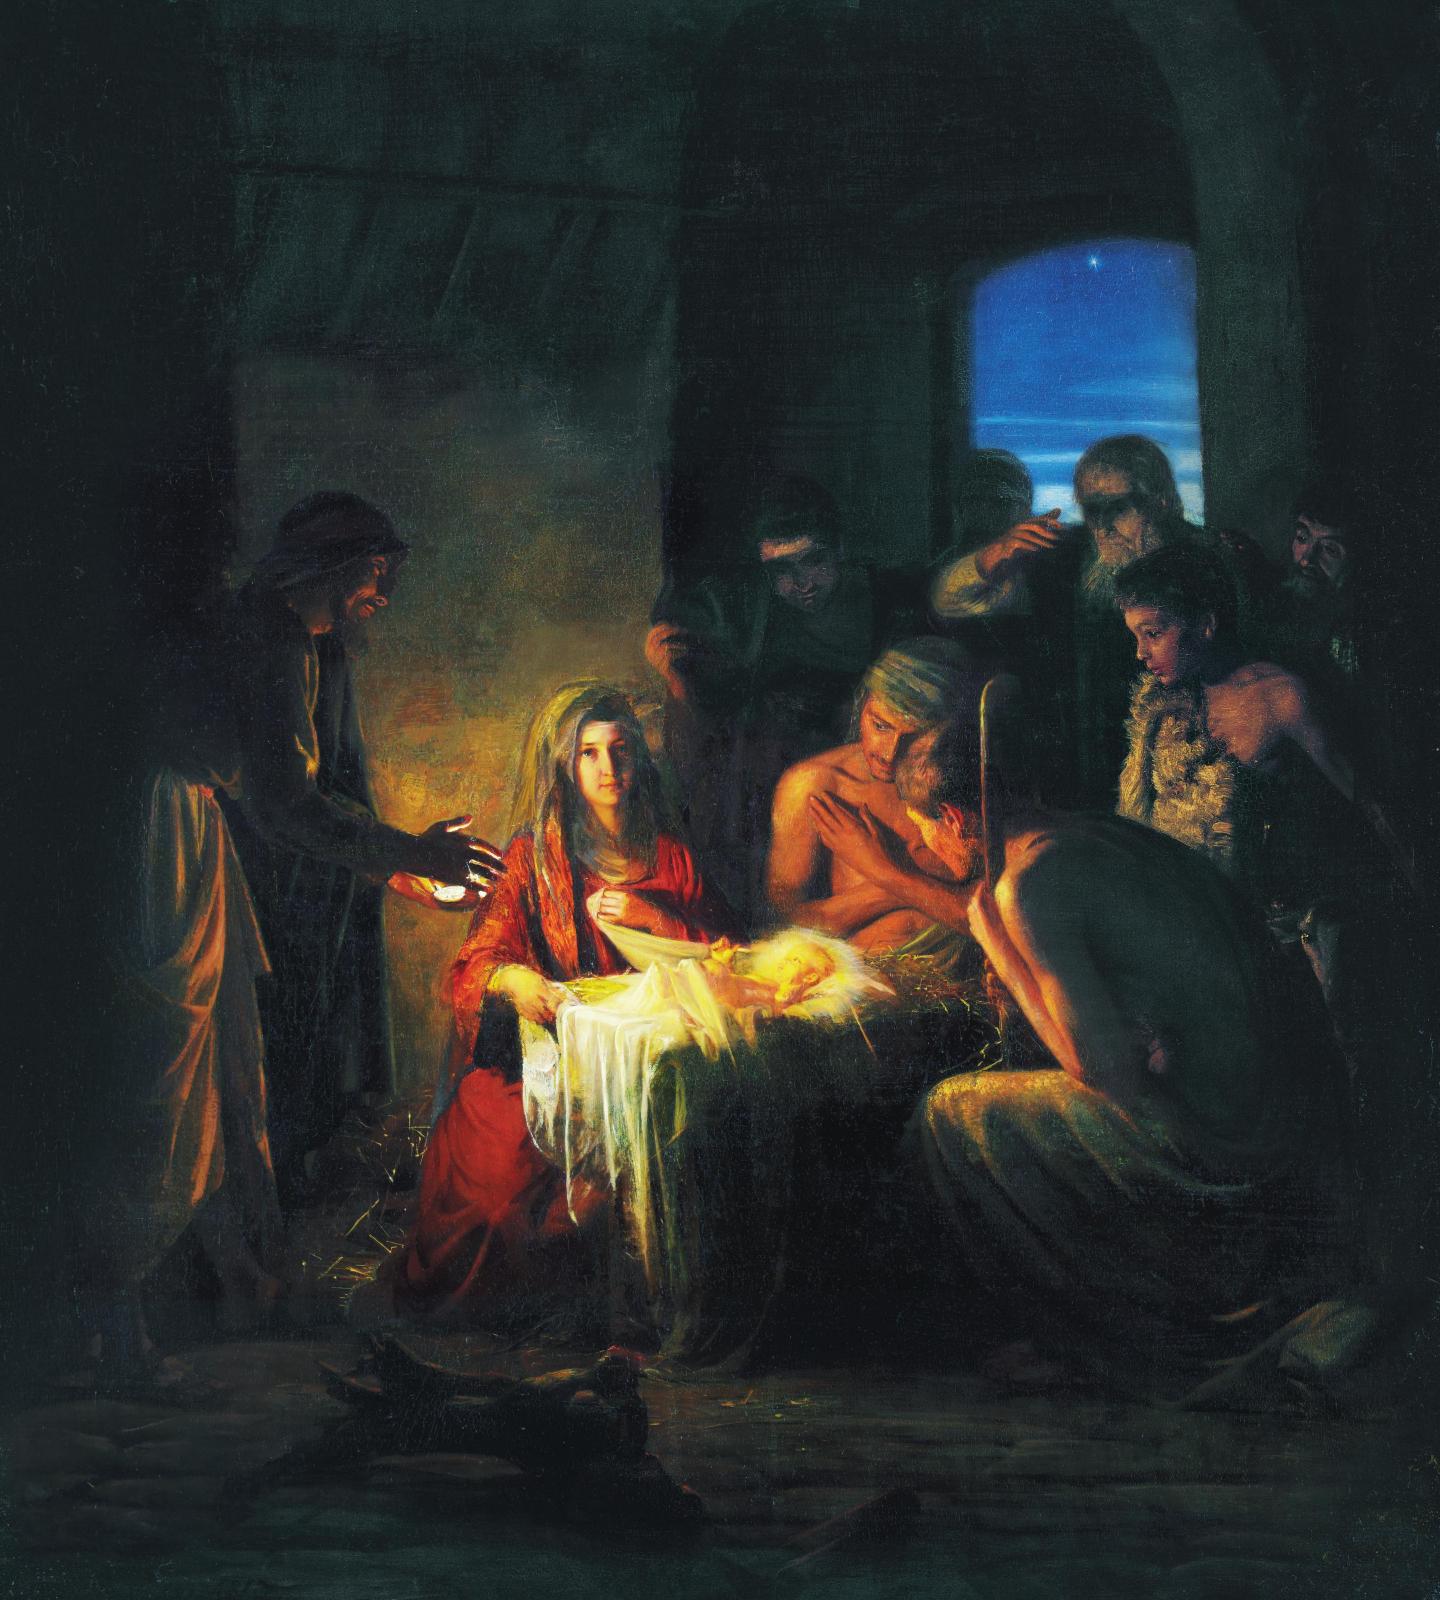 Nativity of Jesus LDS Images & Pictures - Findpik